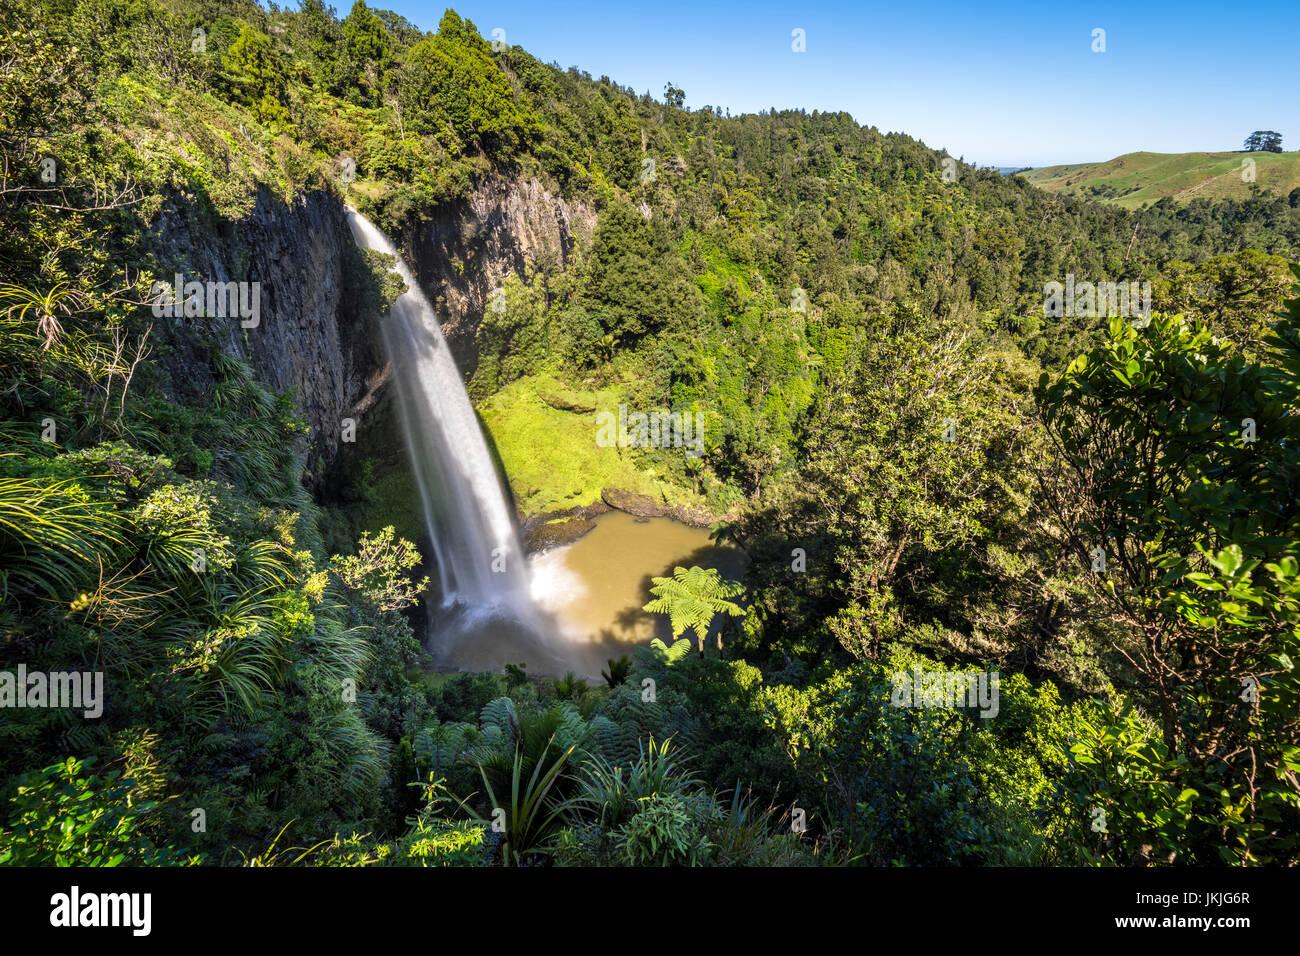 Nuova Zelanda, Isola del nord, raglan, Bridal Veil Falls Immagini Stock